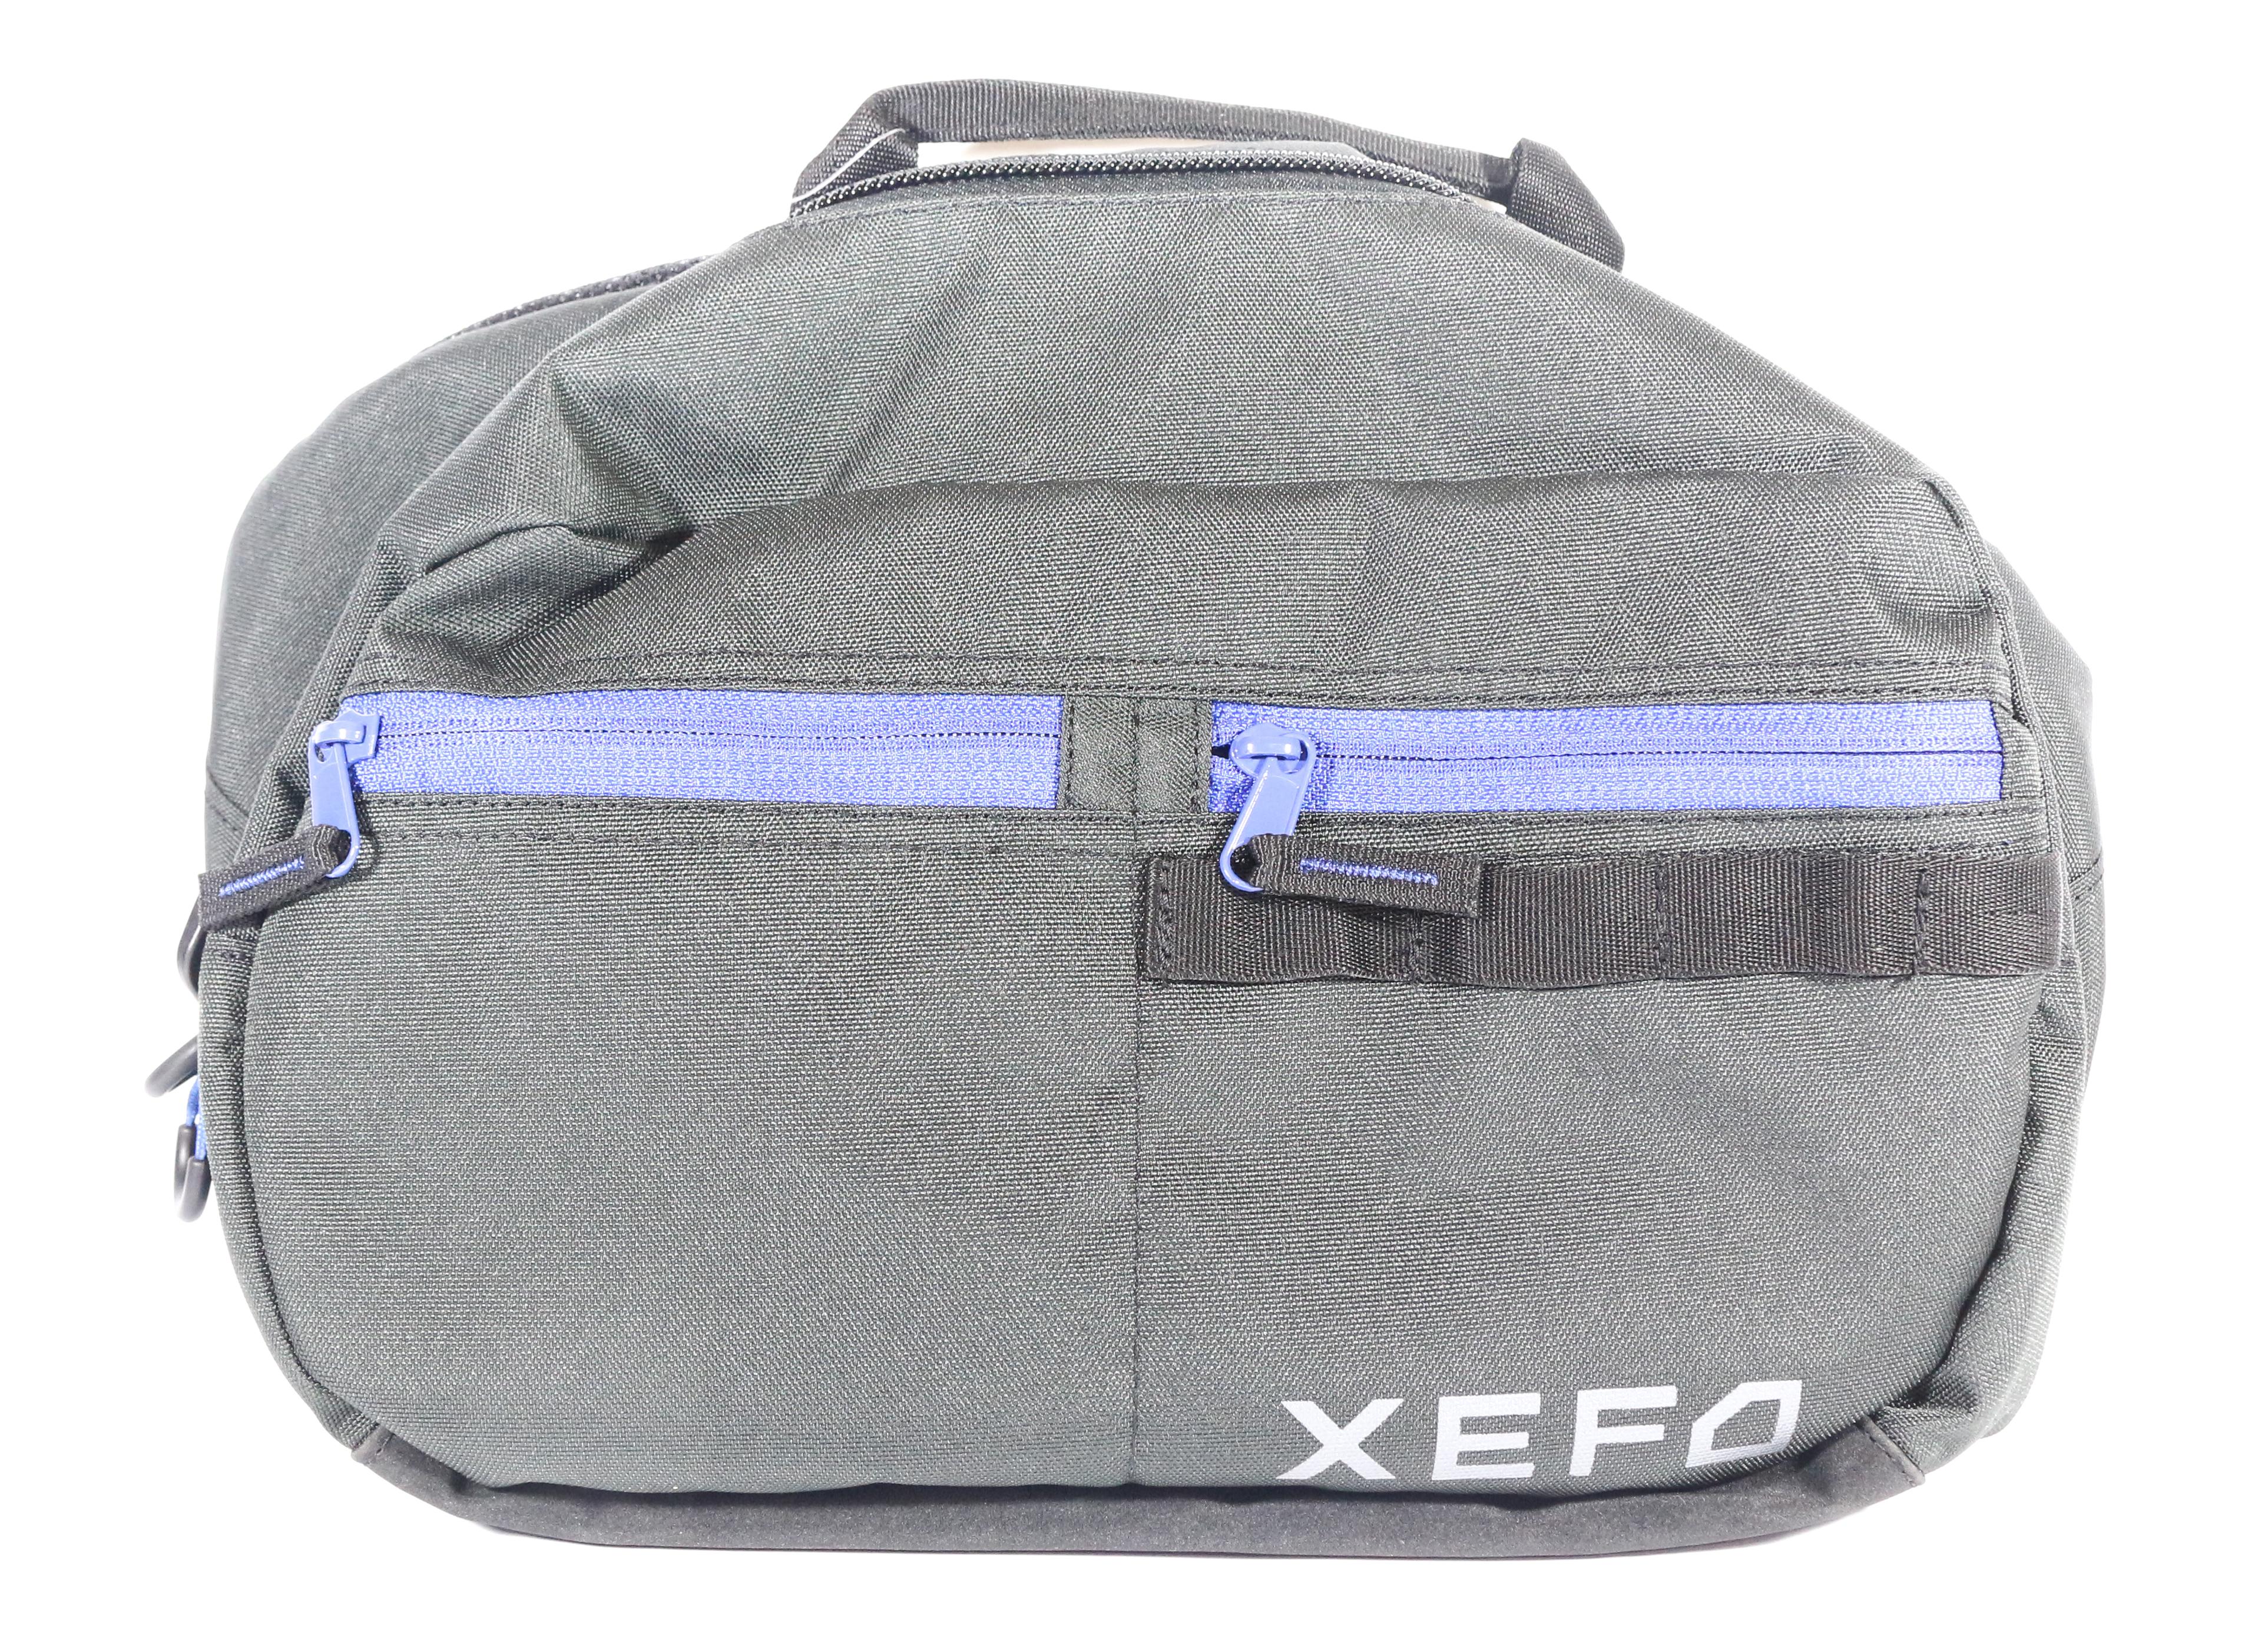 Shimano WB-223P XEFO Hip Bag 17 x 33.5 x 22 cm Black Blue 451736